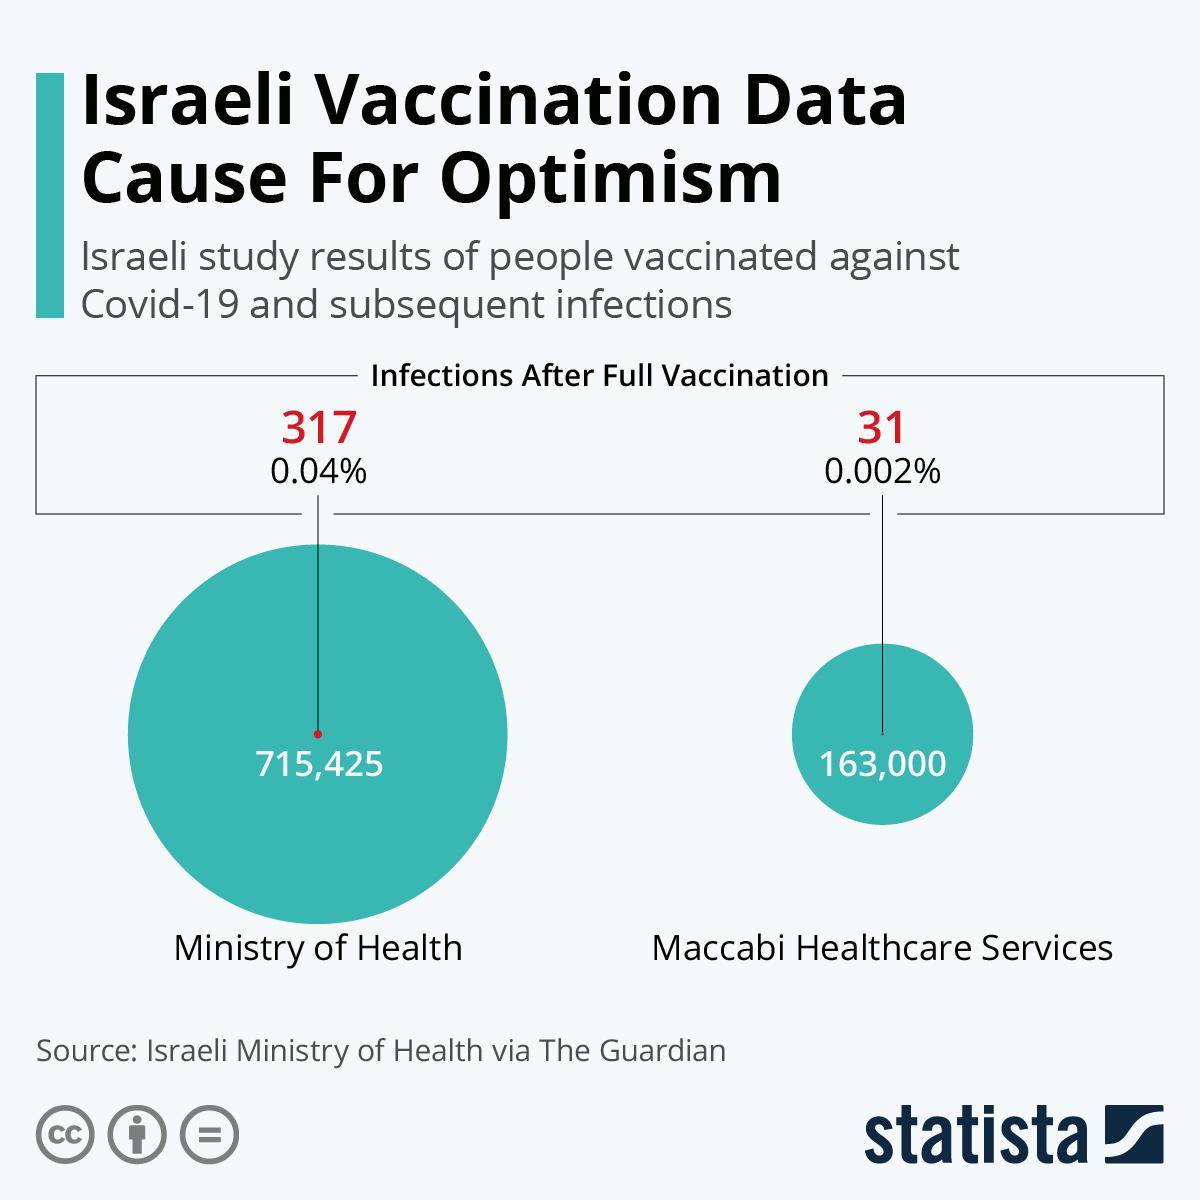 Israeli Vaccination Data Cause For Optimism